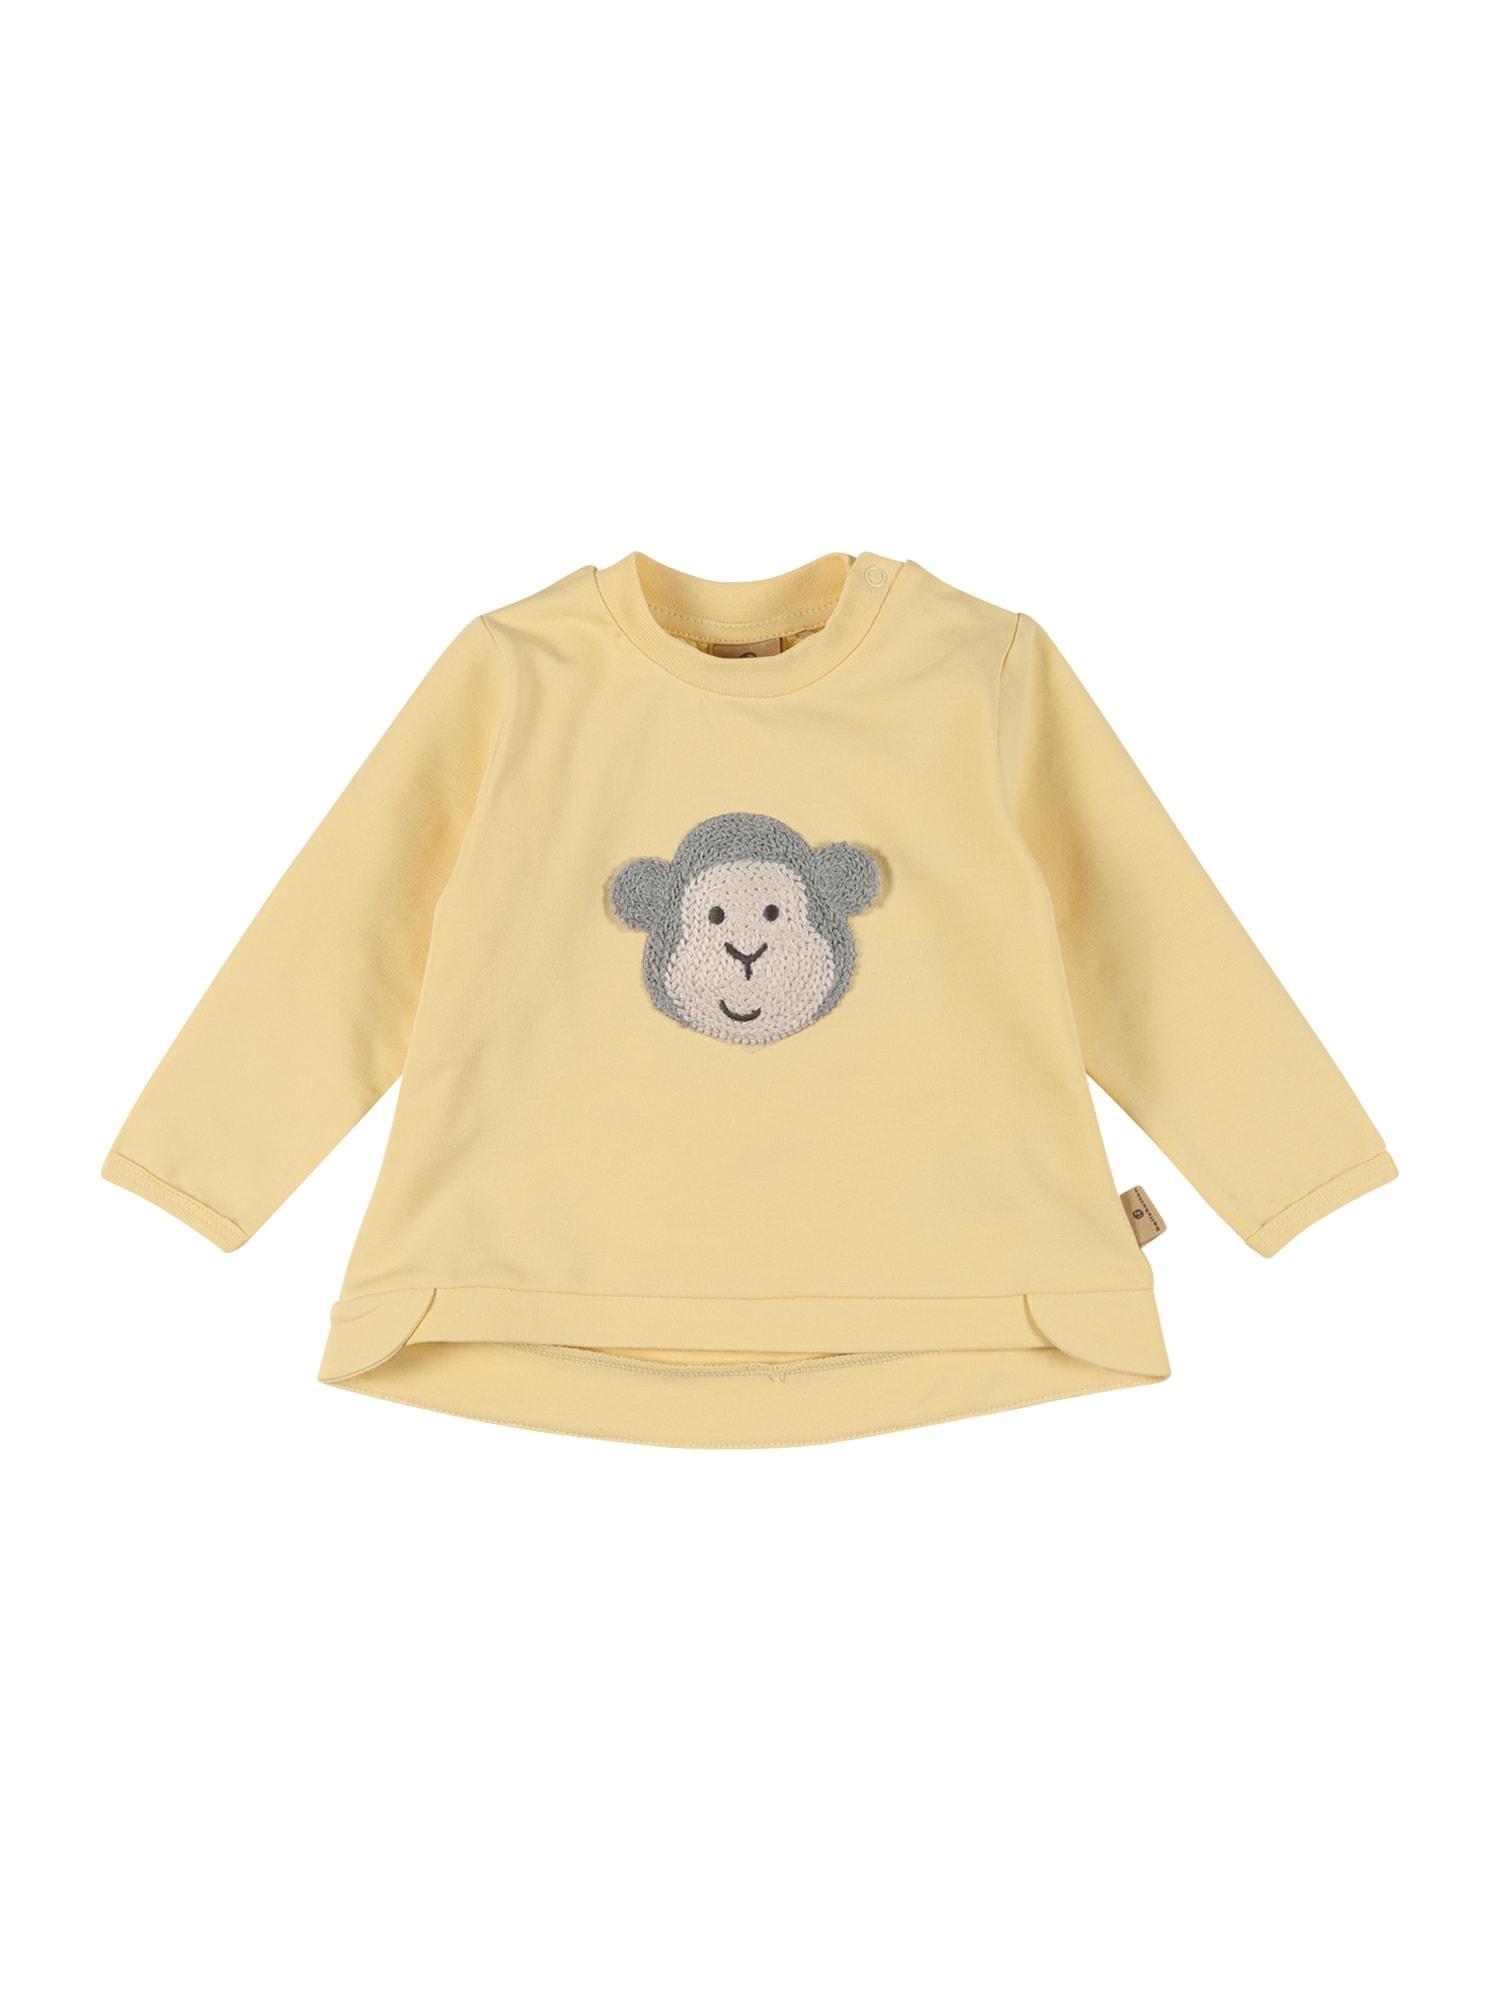 BELLYBUTTON Megztinis be užsegimo geltona / glaisto spalva / pilka / tamsiai pilka